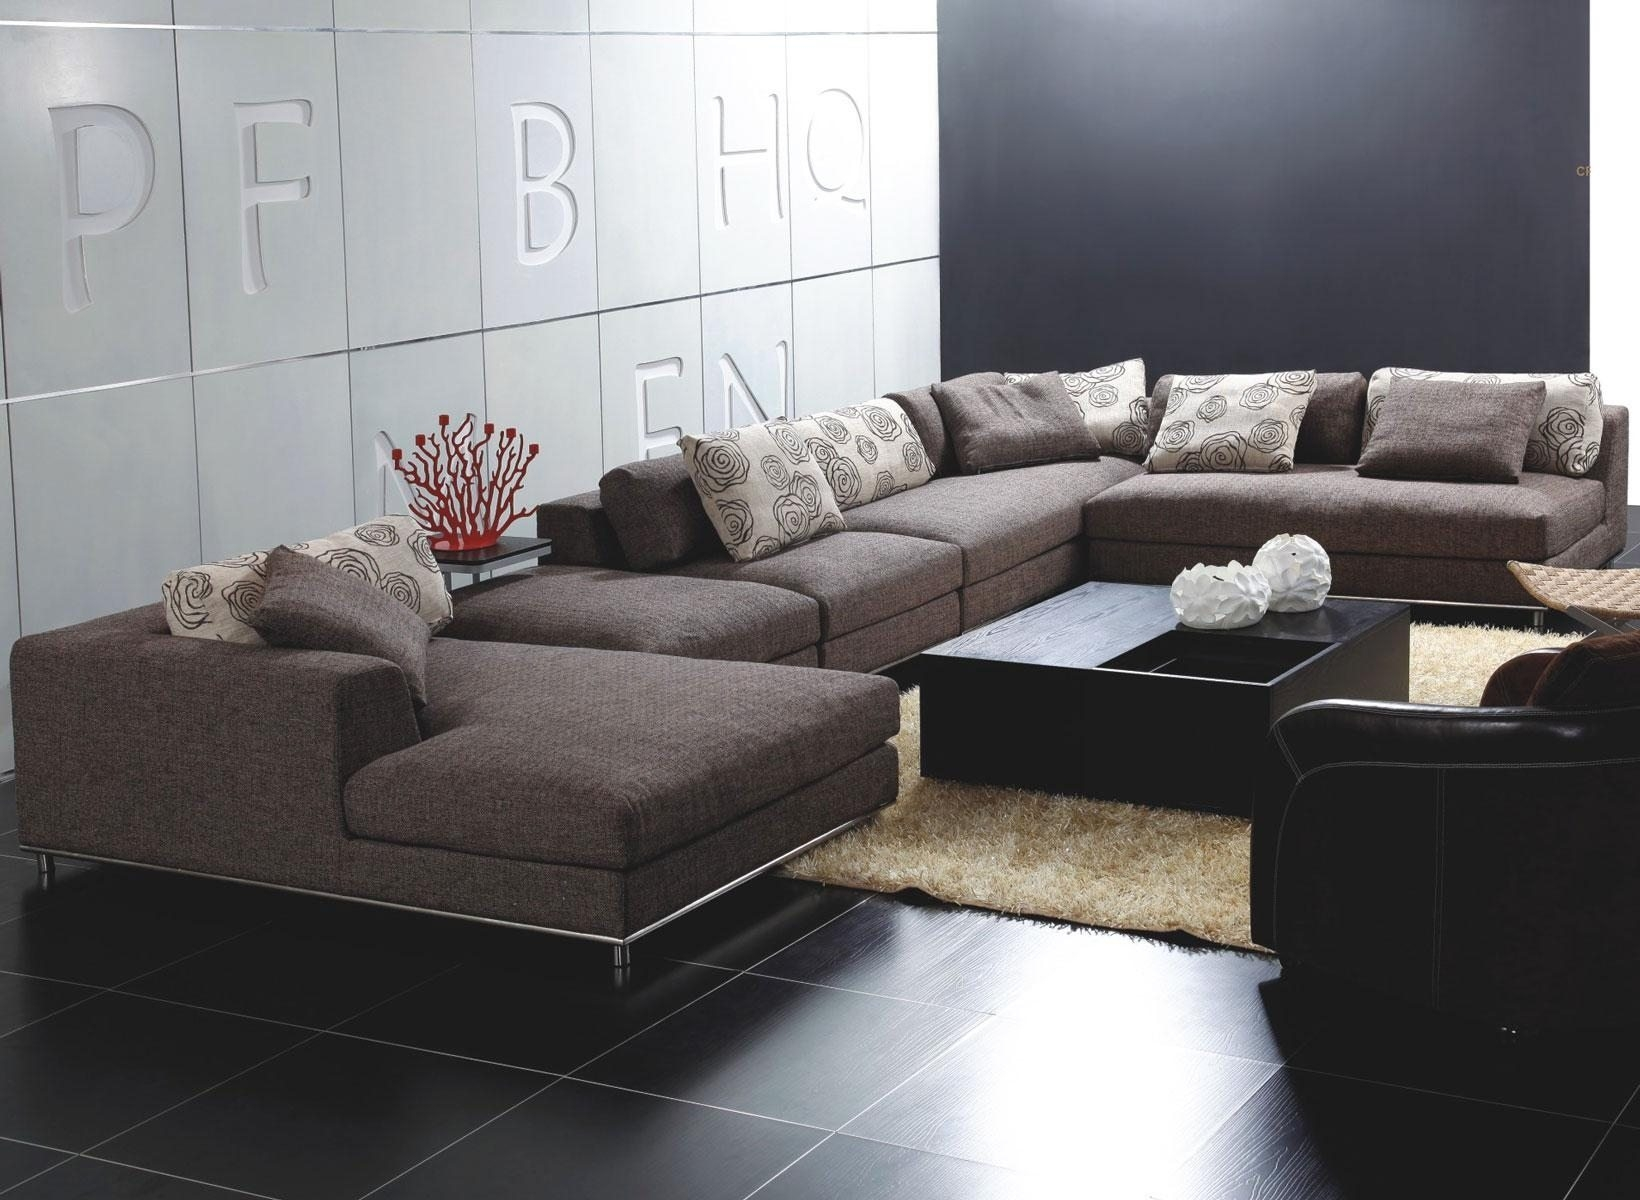 Berkline Sectional Sofa 43 With Berkline Sectional Sofa Bible Throughout Berkline Sectional Sofa (#5 of 12)